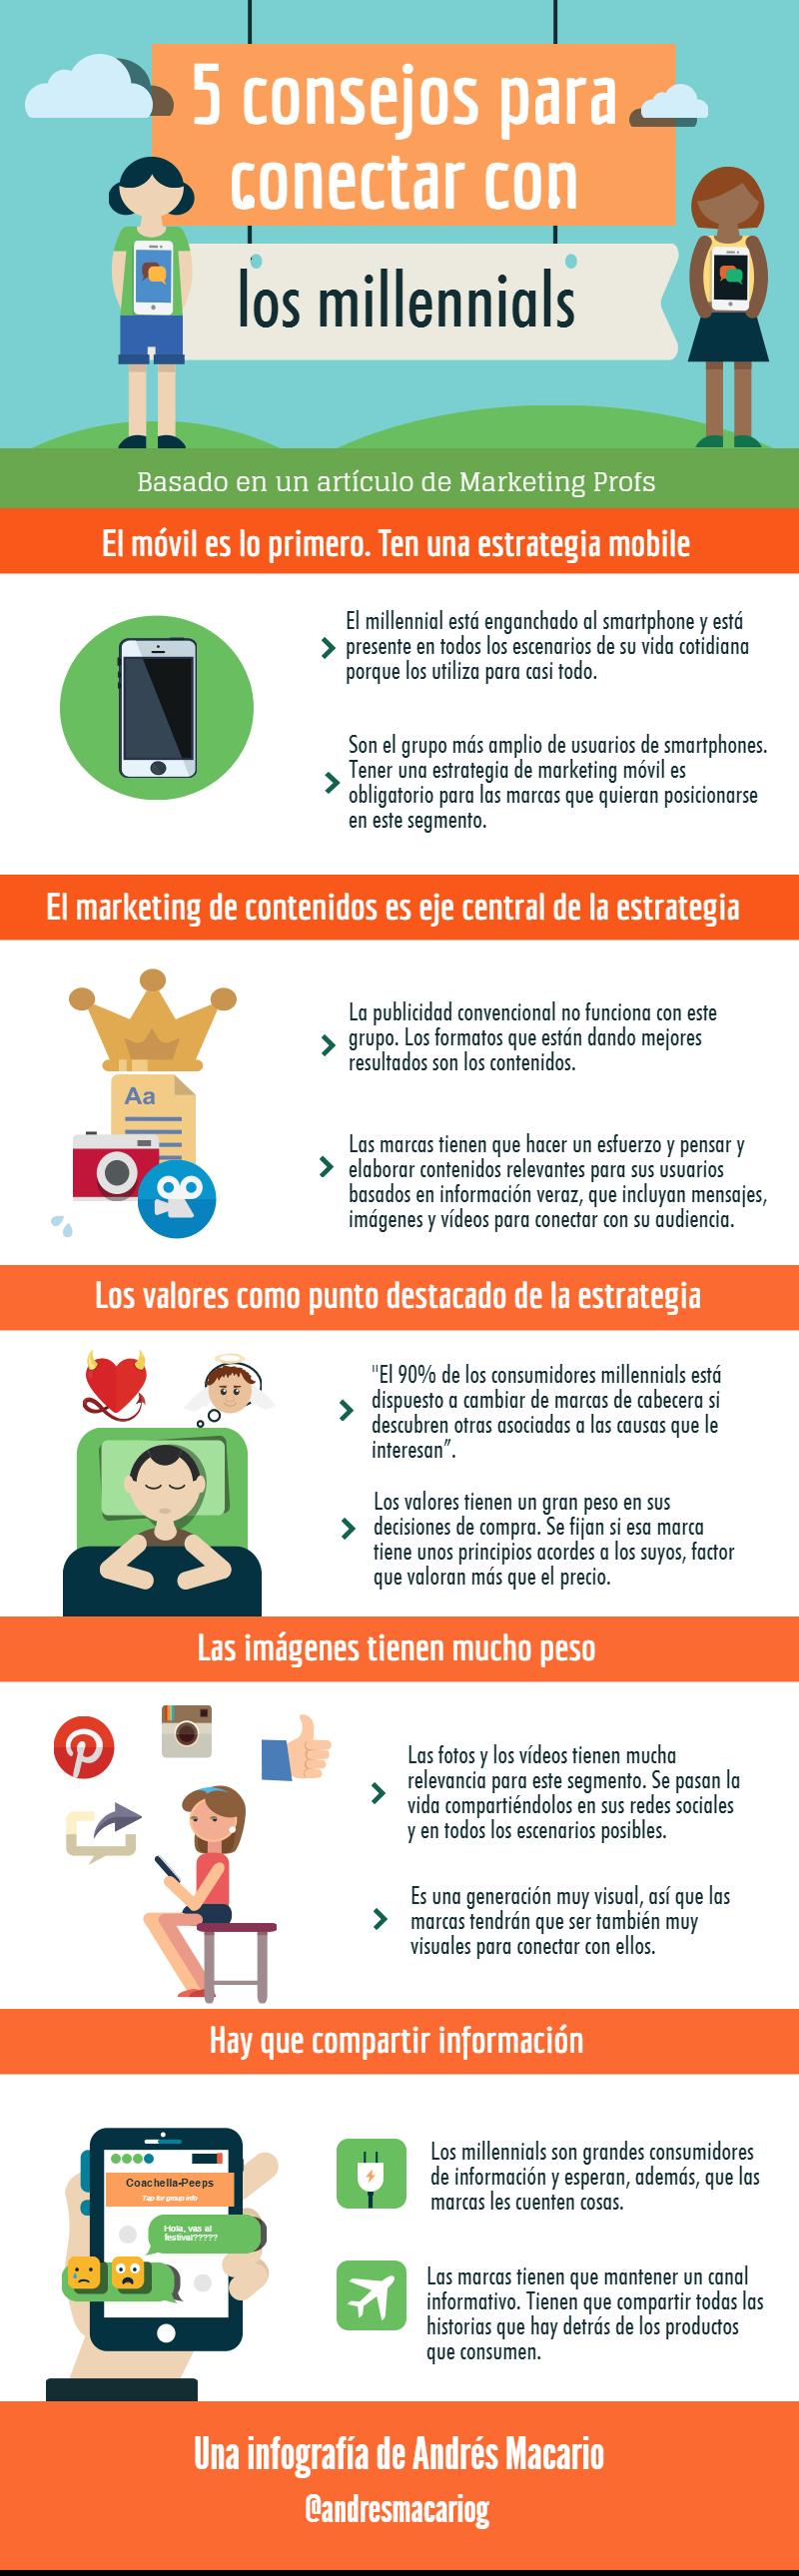 5 consejos para conectar con los millennials - Infografia Andres Macario